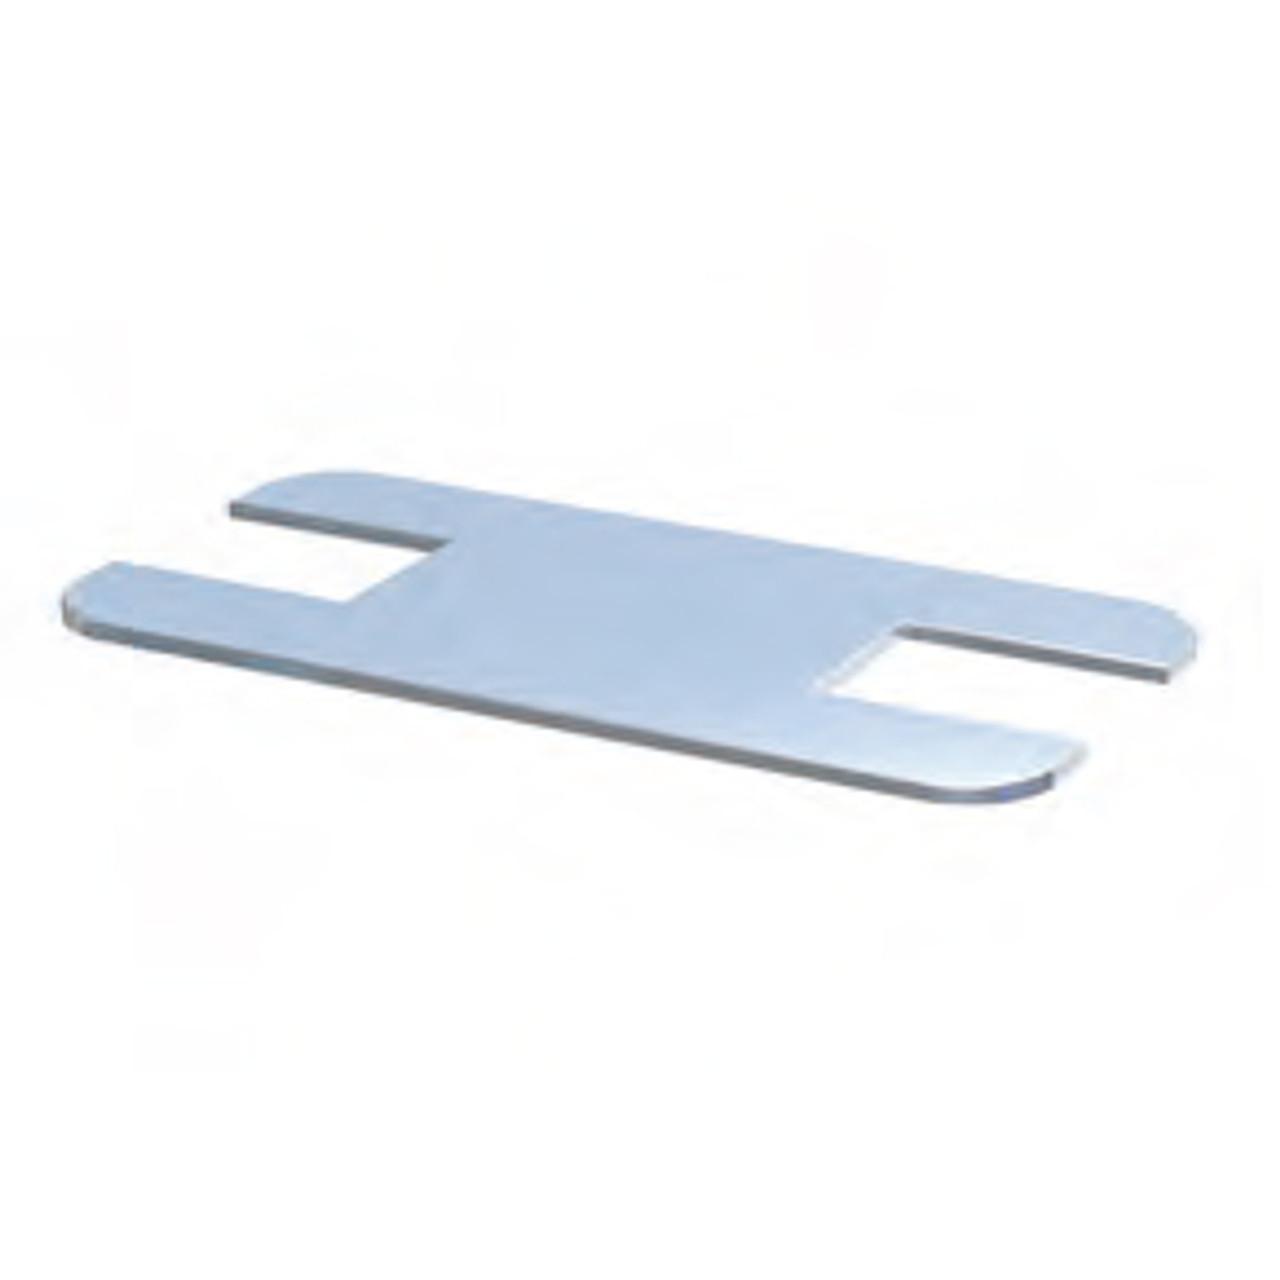 LP5316 Locking Plate